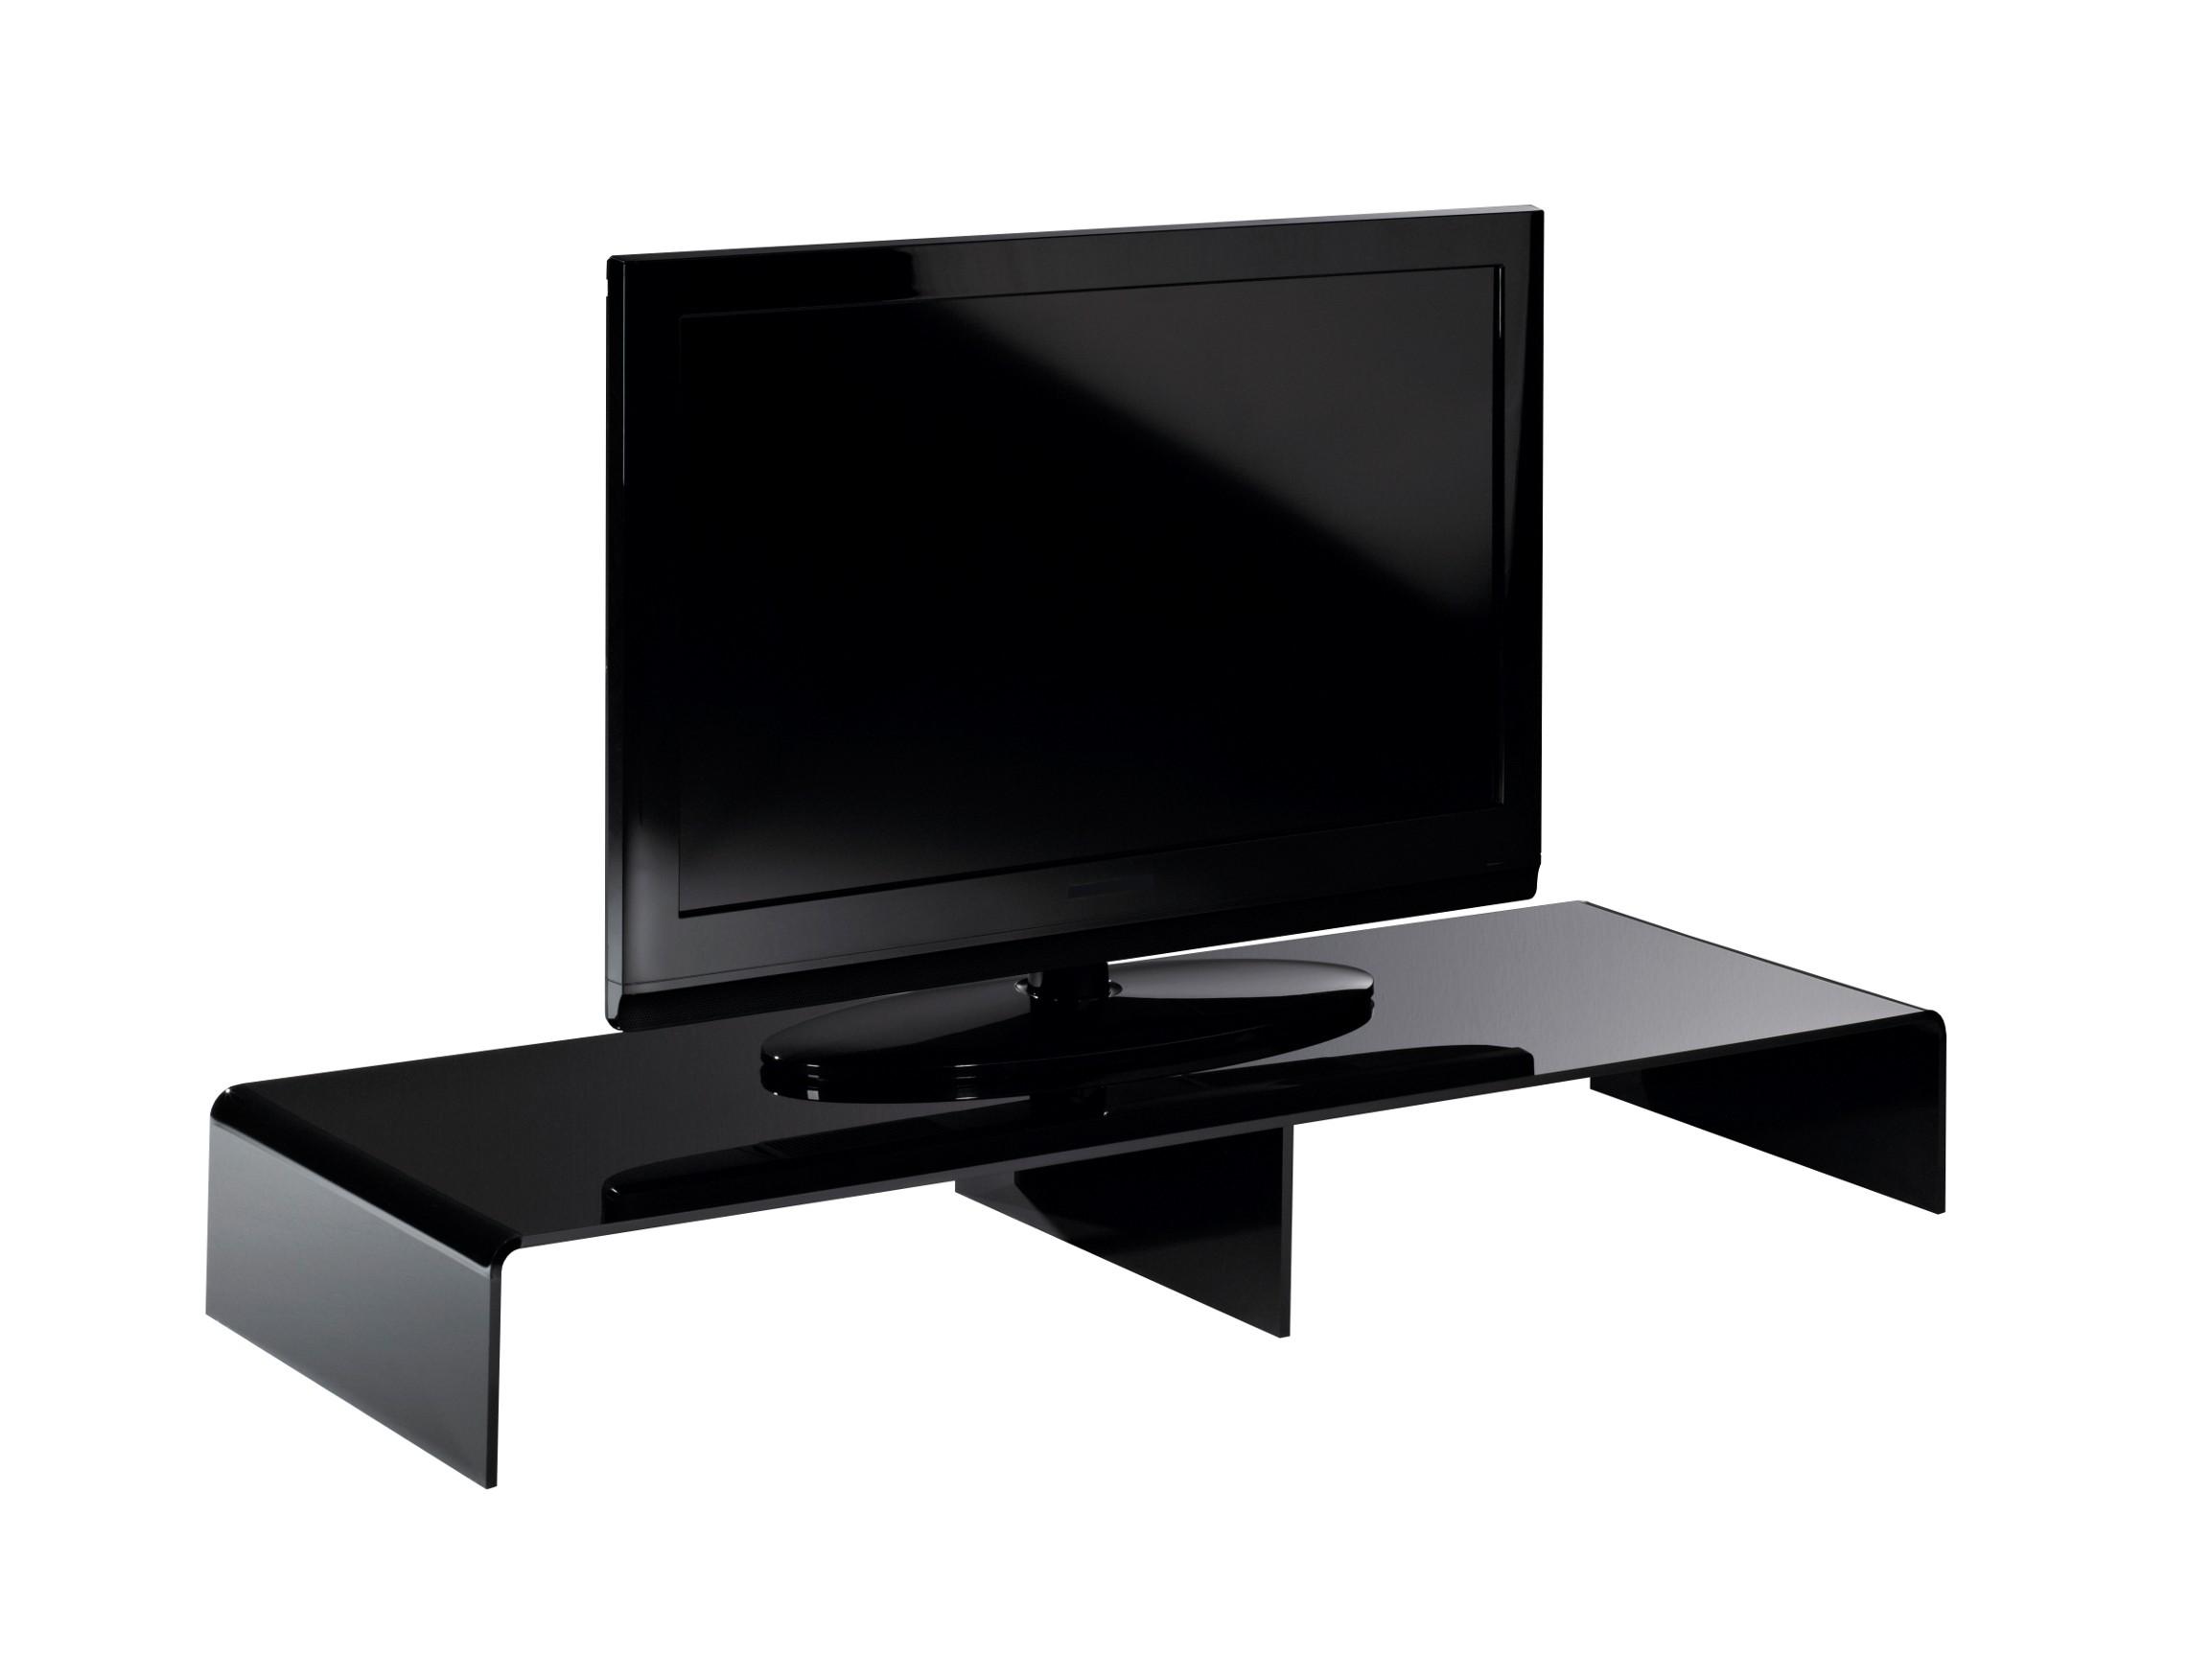 tv konsole new york breite 80 cm acrylglas schwarz wohnen tv m bel tv lowboards. Black Bedroom Furniture Sets. Home Design Ideas